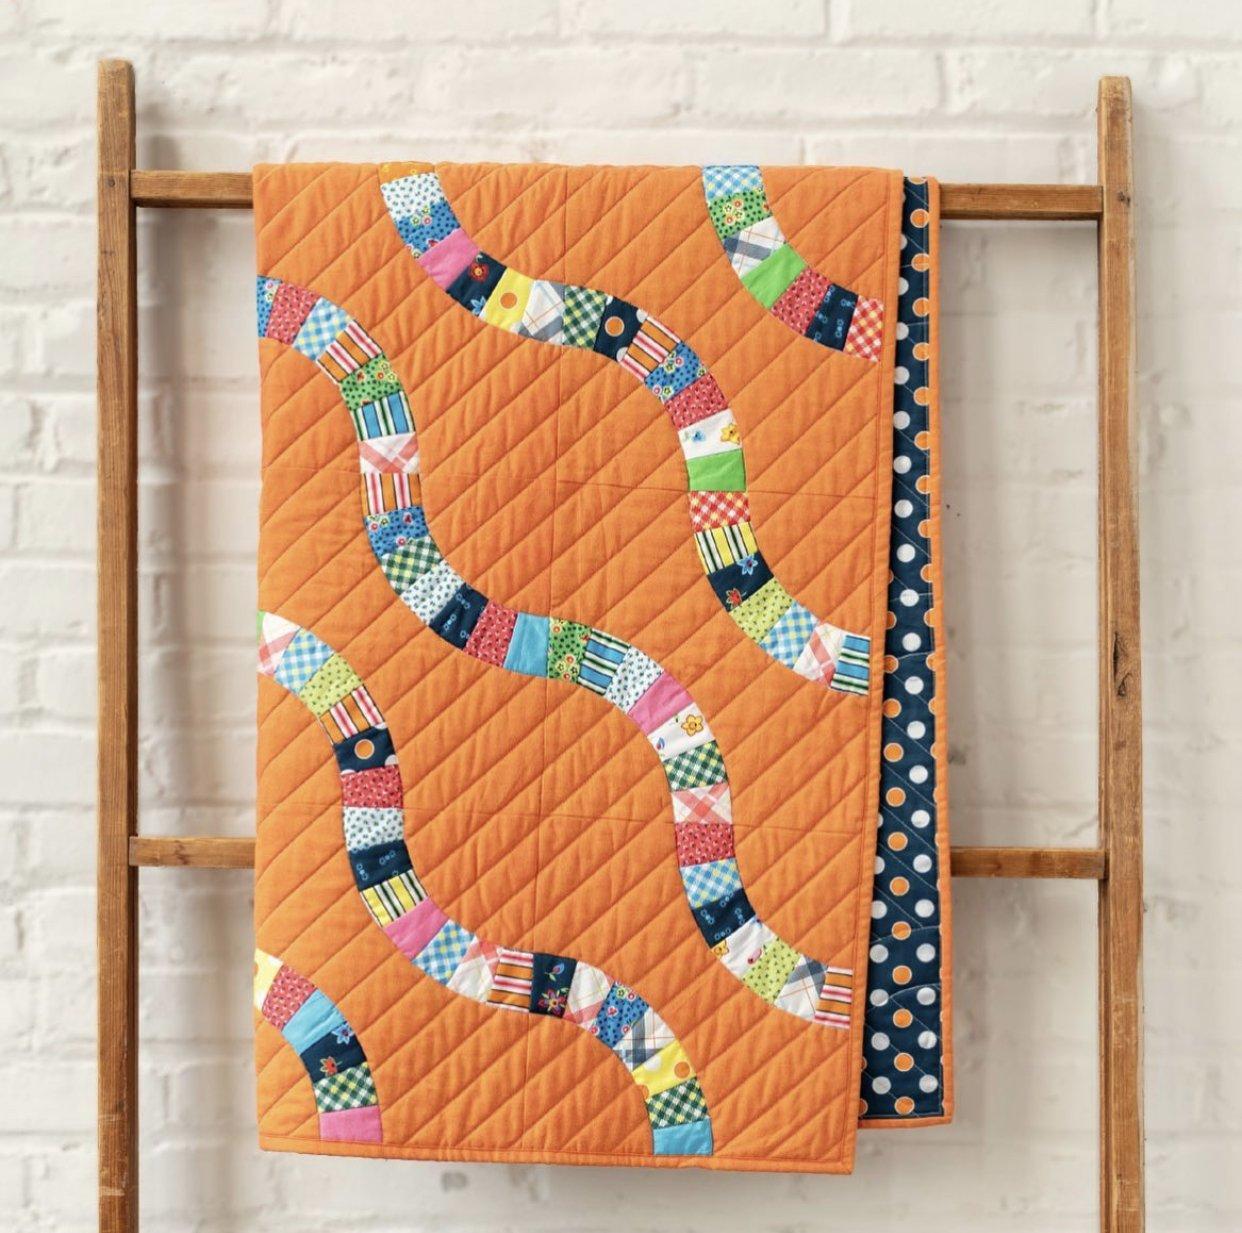 STQKFT Snake Trails Quilt Kit by Denyse Schmidt for Windham Fabrics